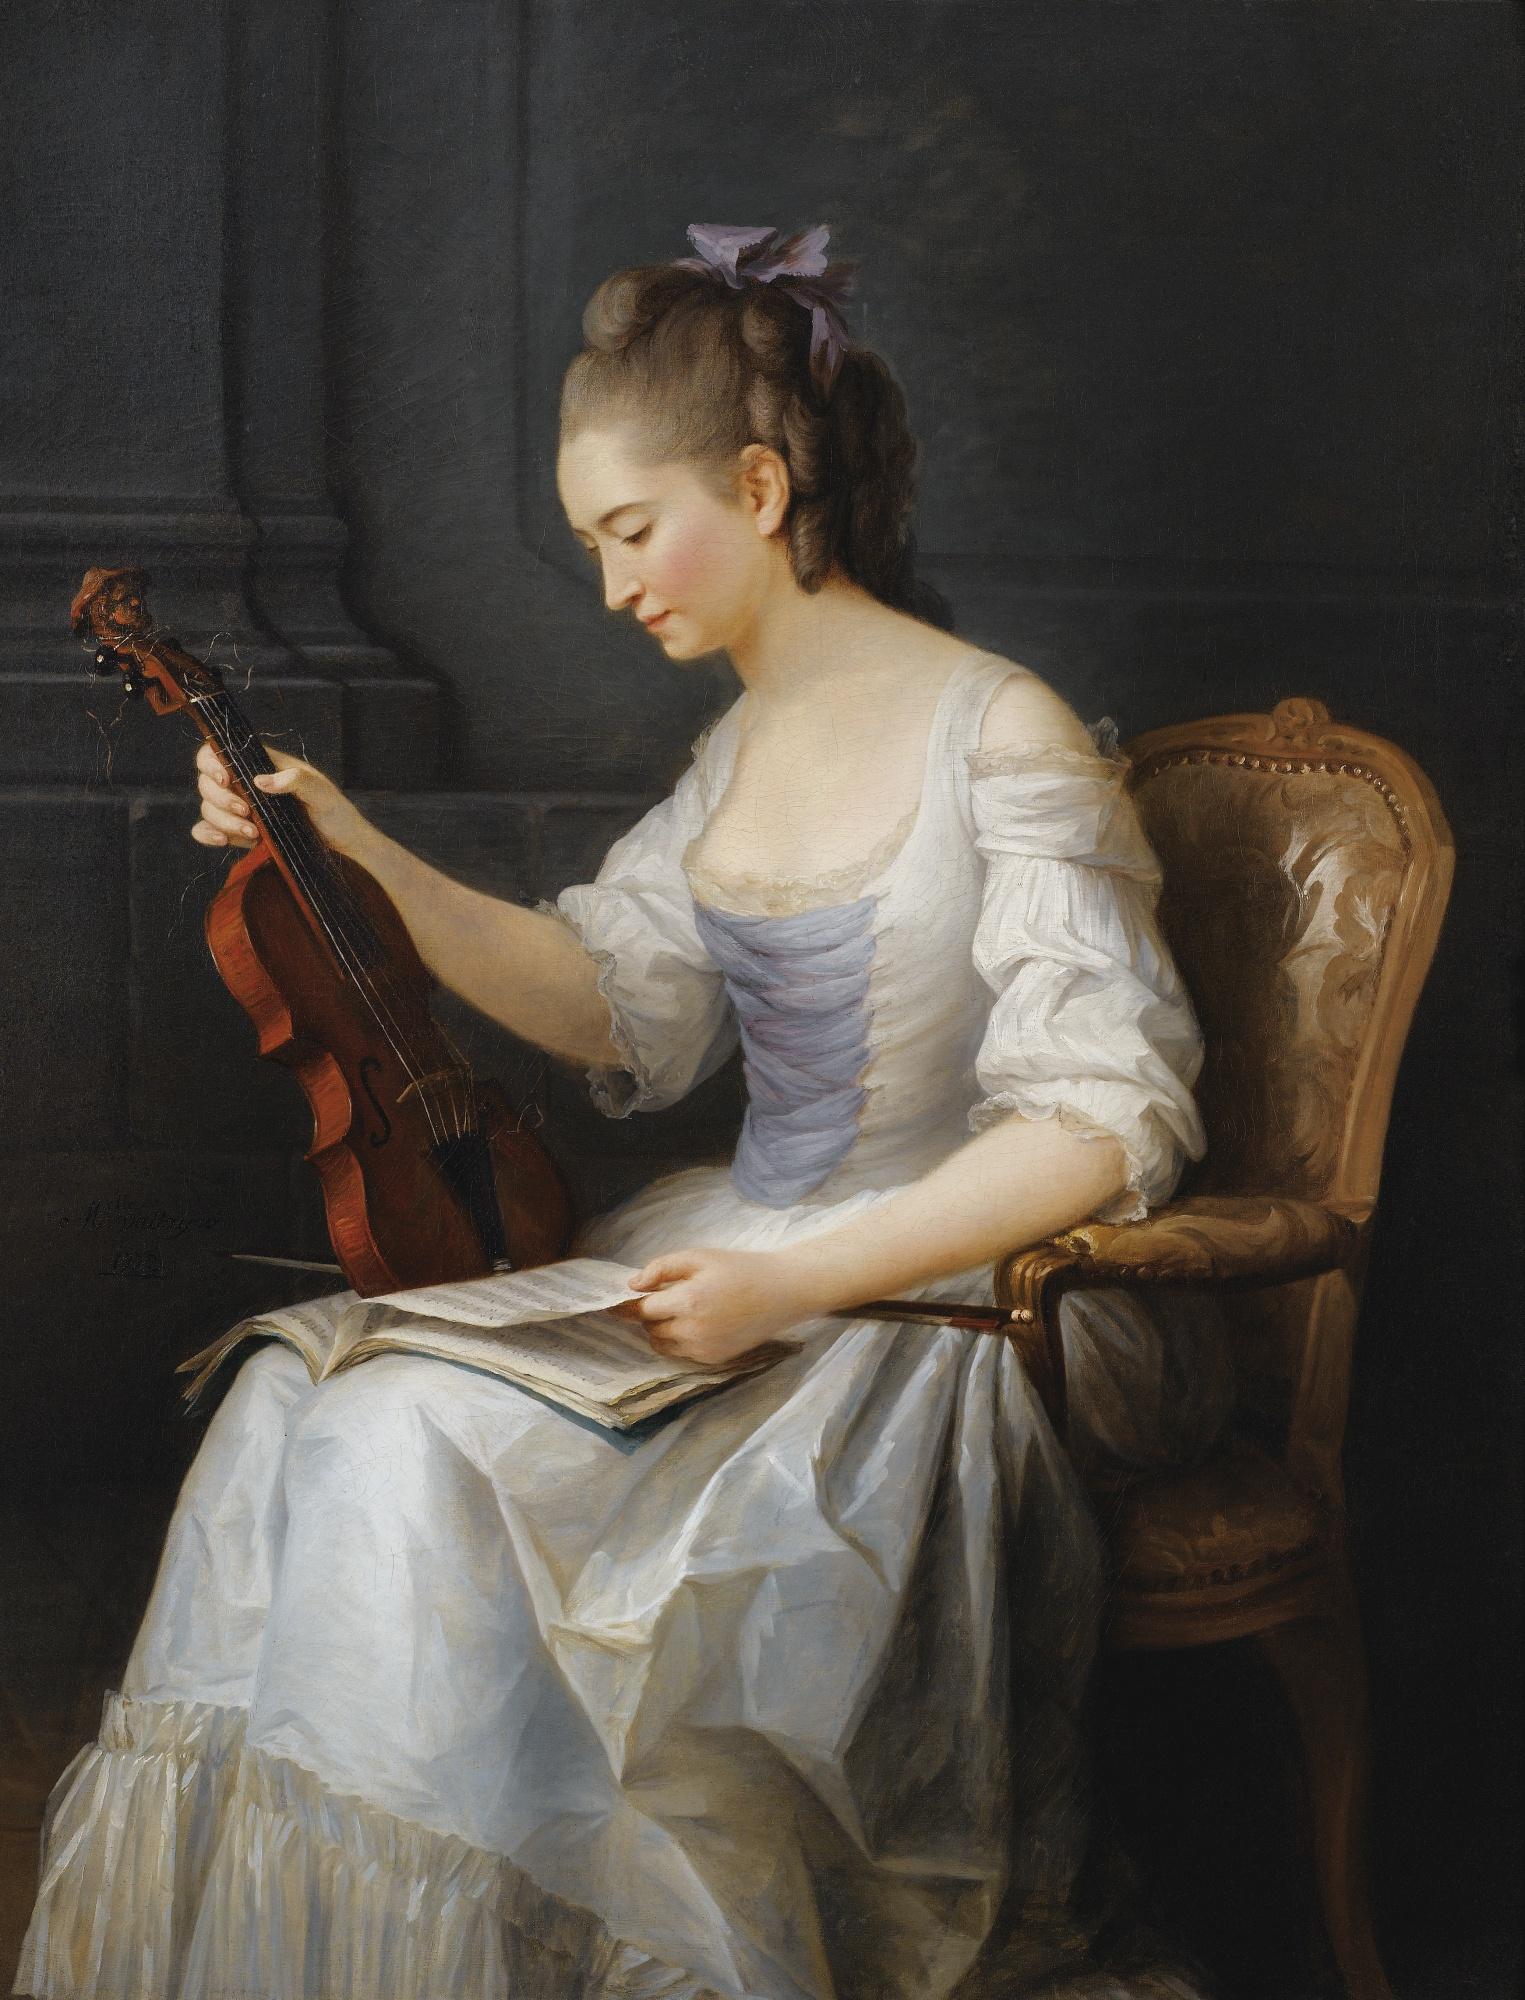 Anne_Vallayer-Coster,_Portrait_of_a_Violinist.jpg